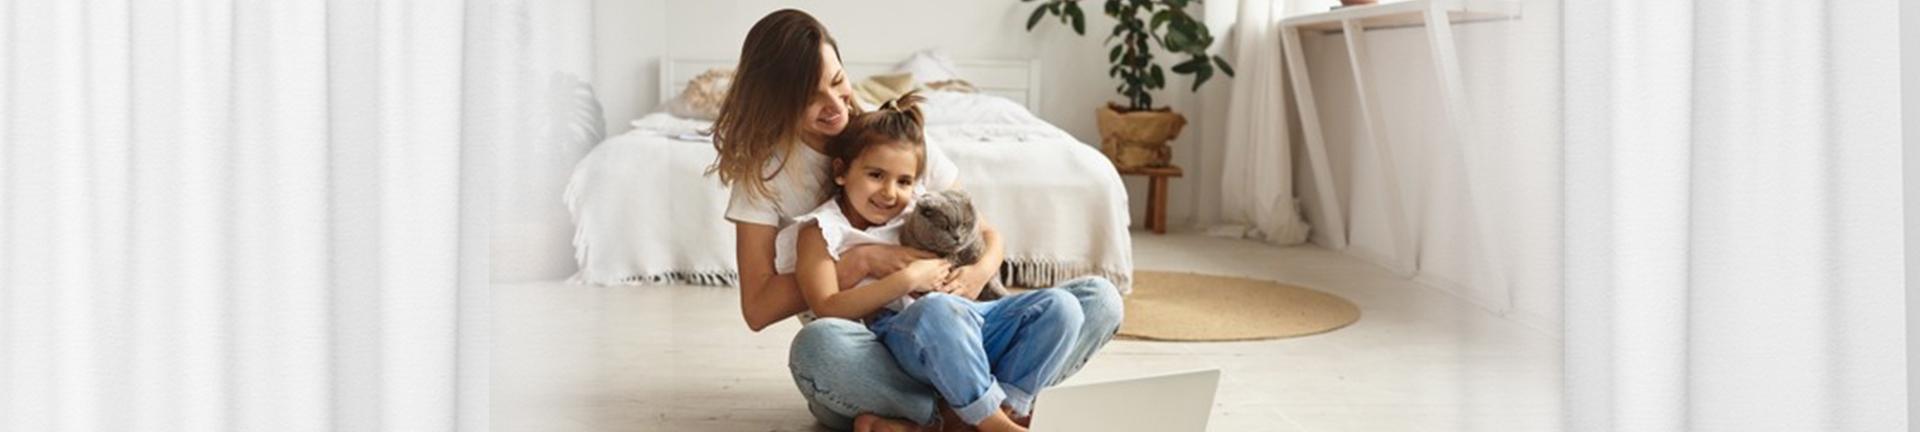 tips for Homeschooling-Parent